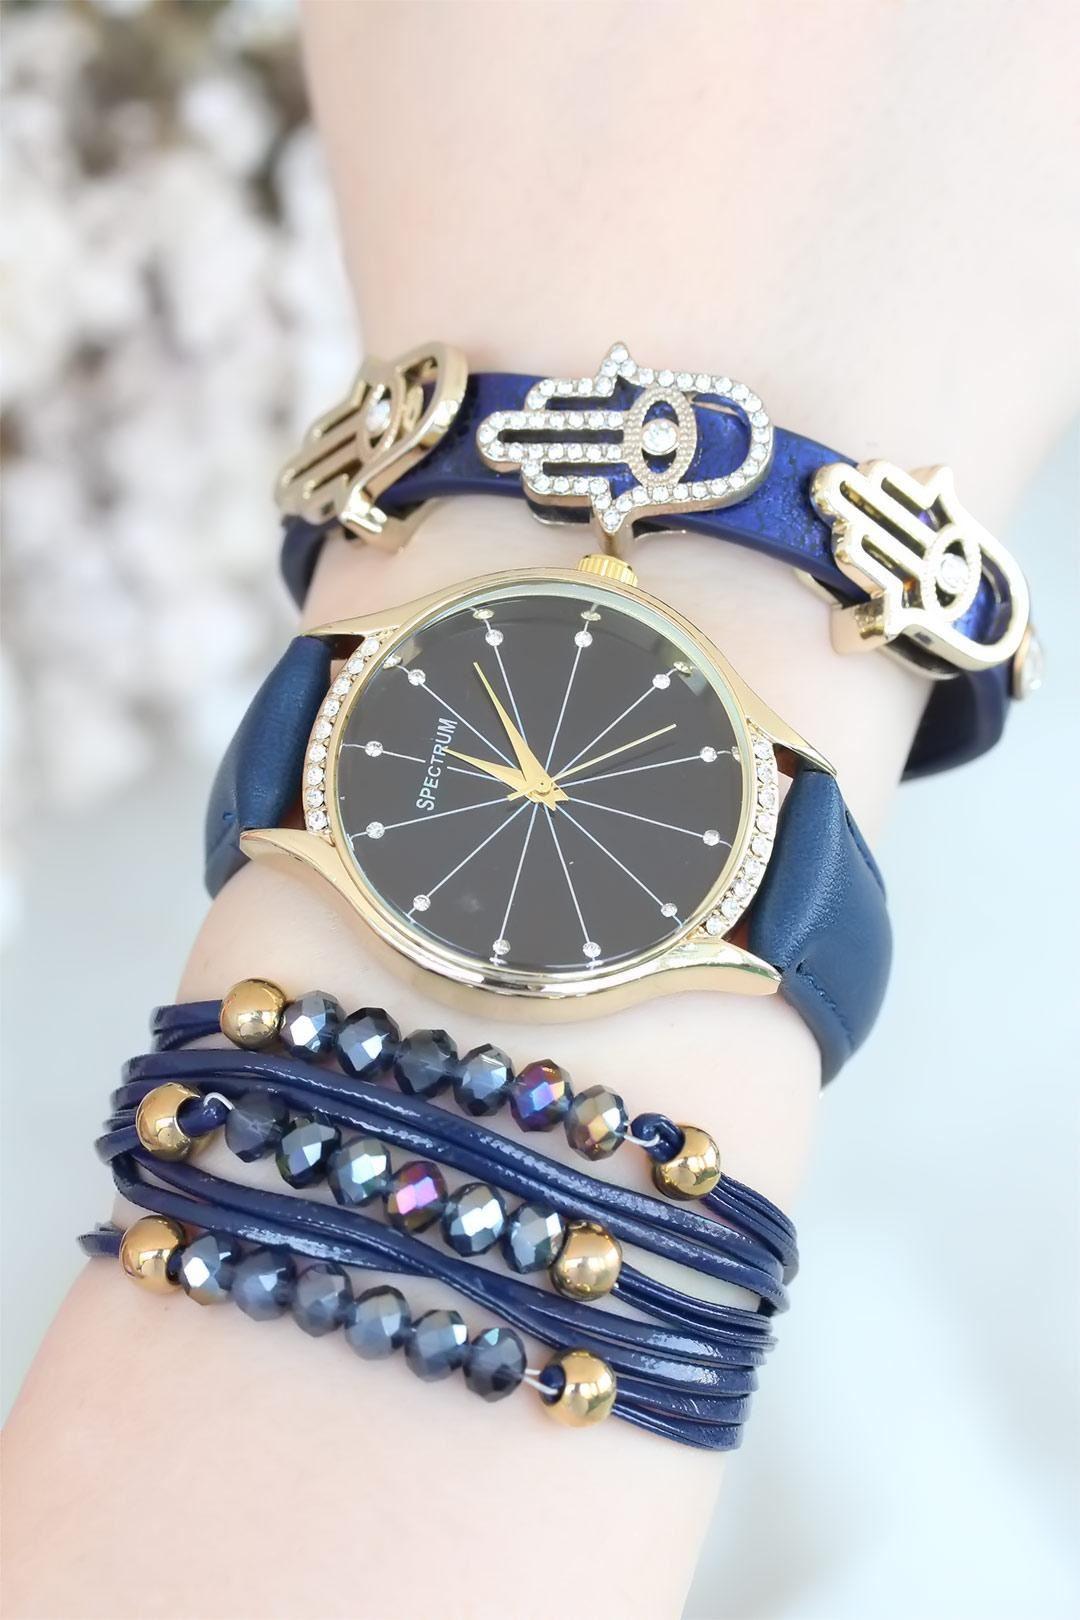 Lacivert Renk Deri Kordonlu Bayan Saat Kombini